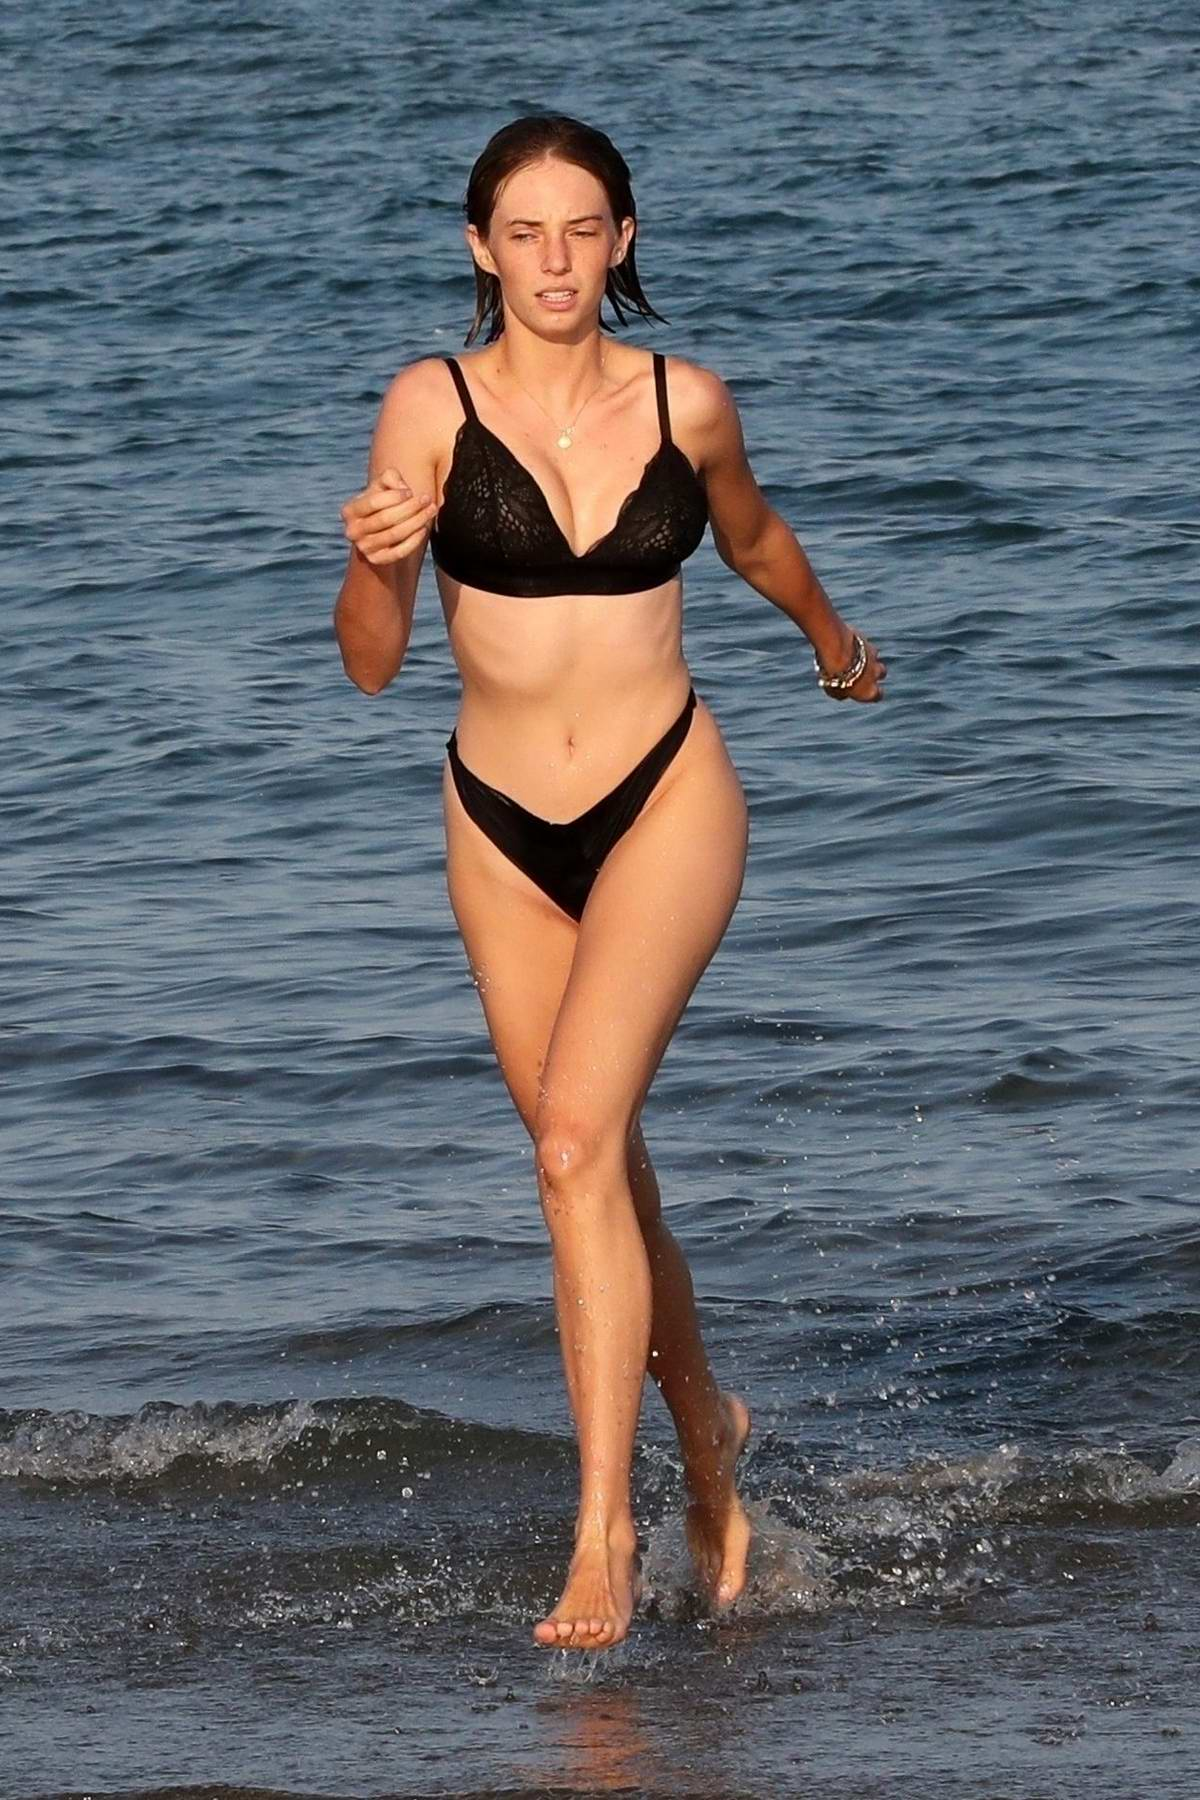 Maya Hawke slips into a black bikini as she hits the beach in Venice, Italy